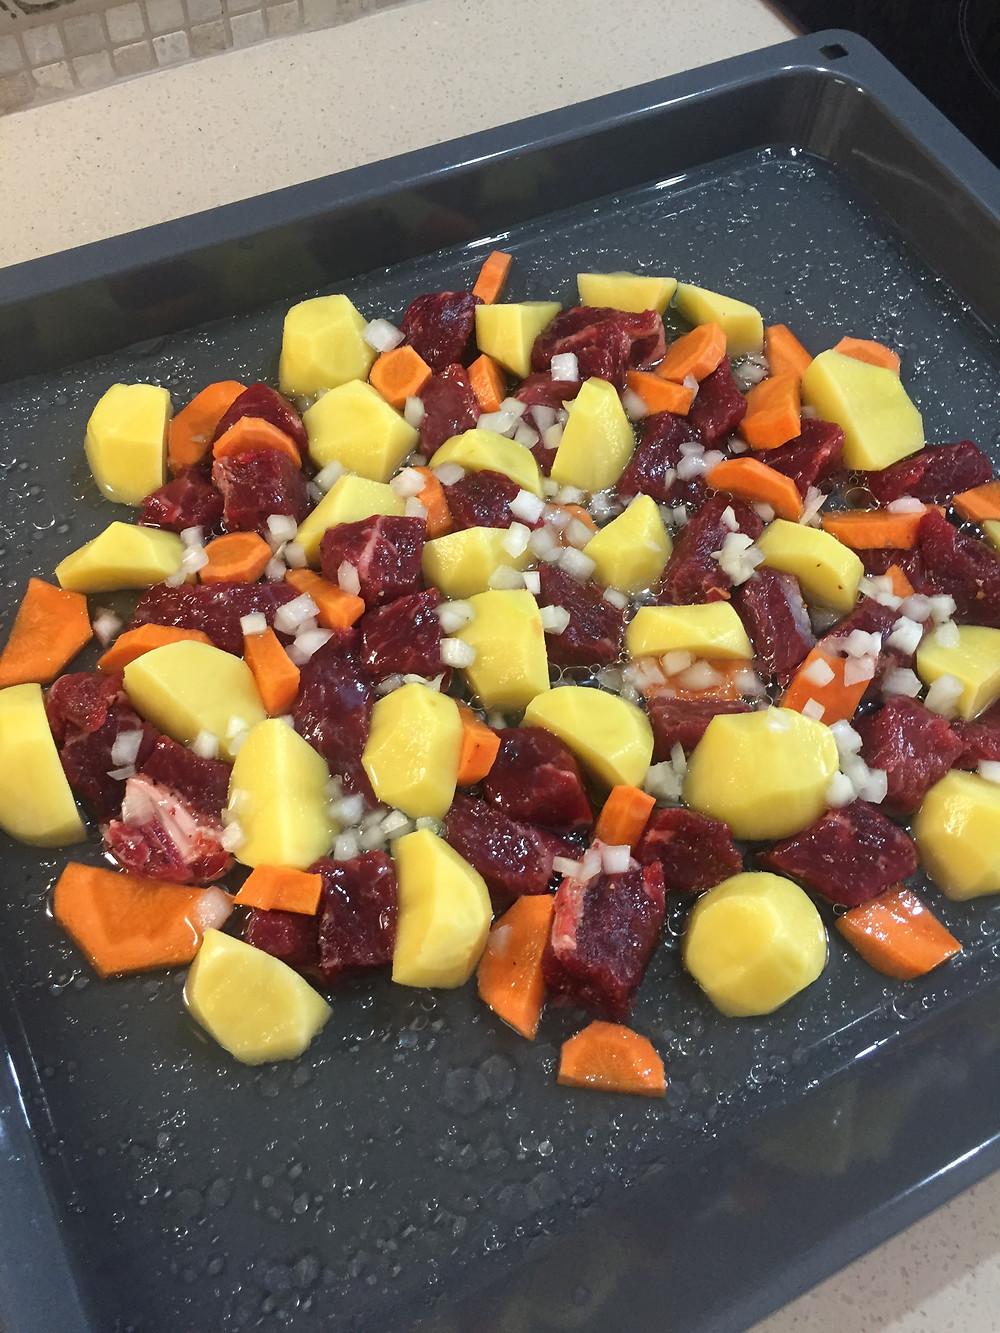 Рецепт тушеного мяса с овощами. Готовим дома сами